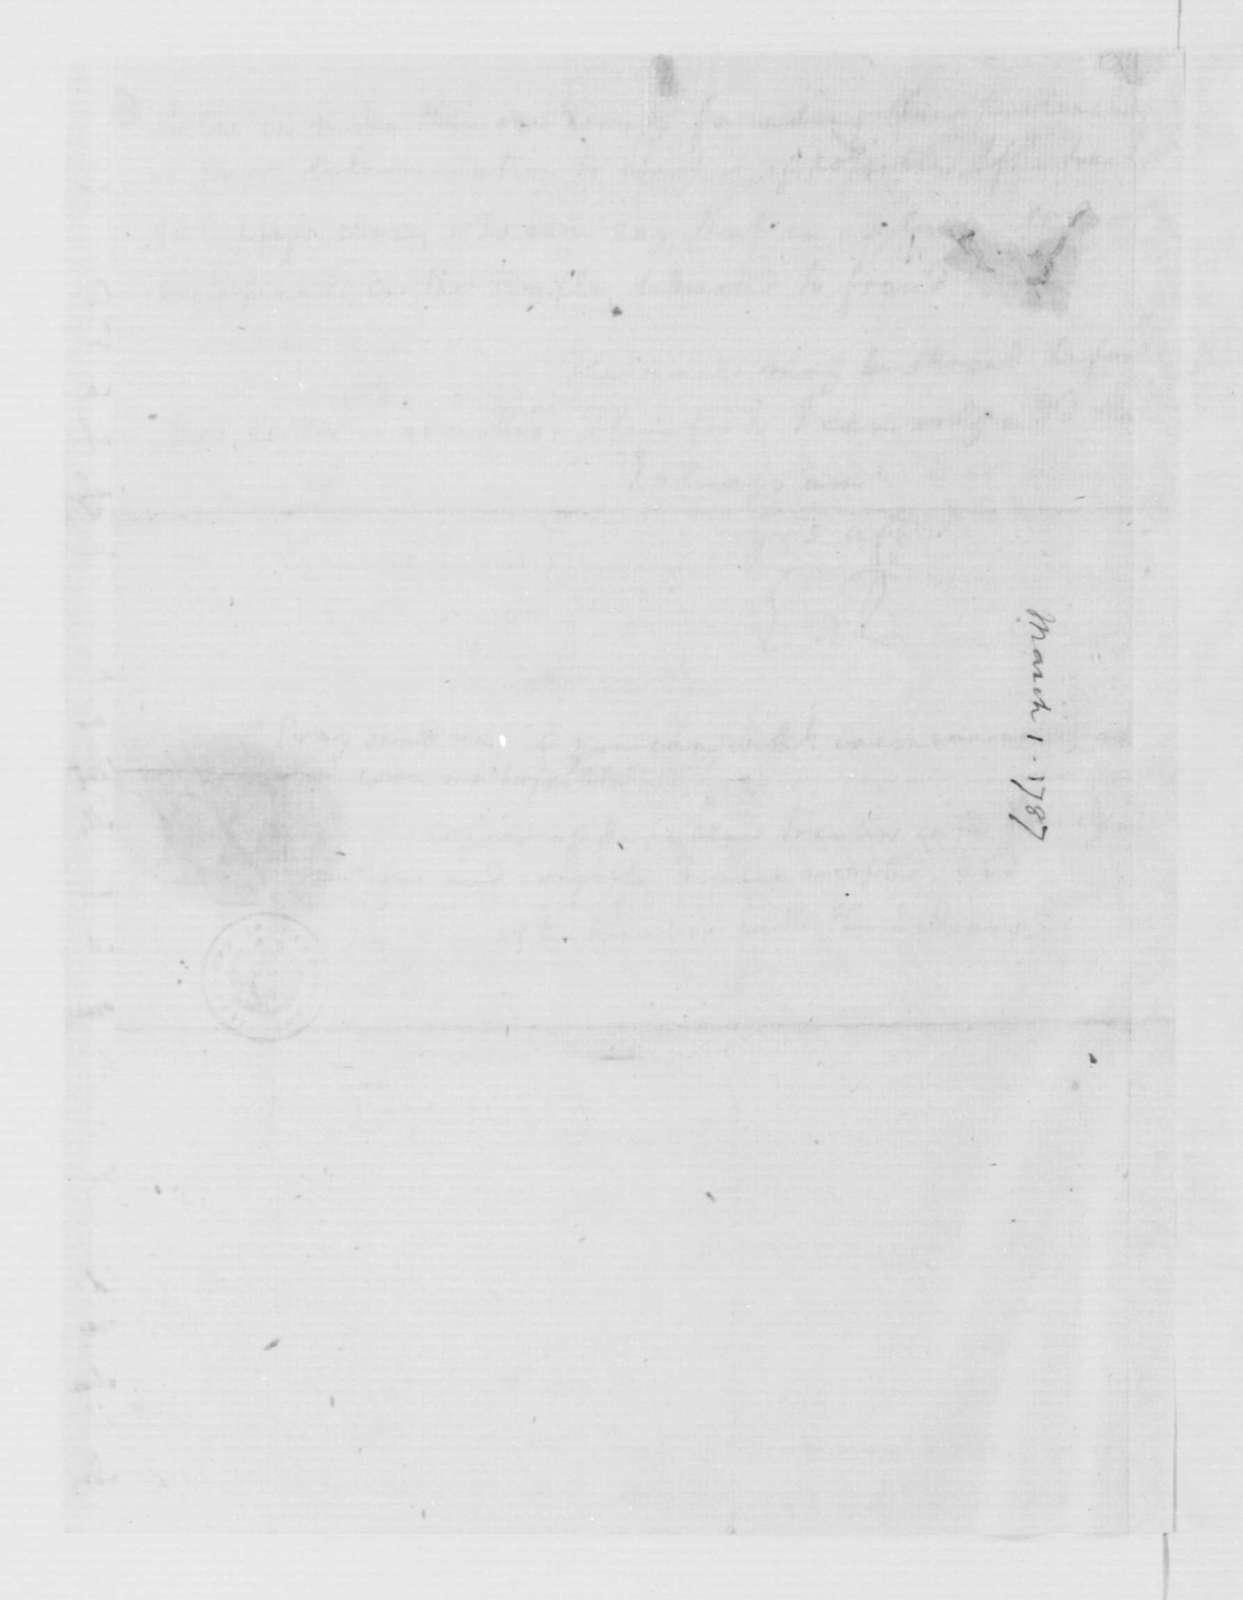 Edmund Randolph to James Madison, March 1, 1787.